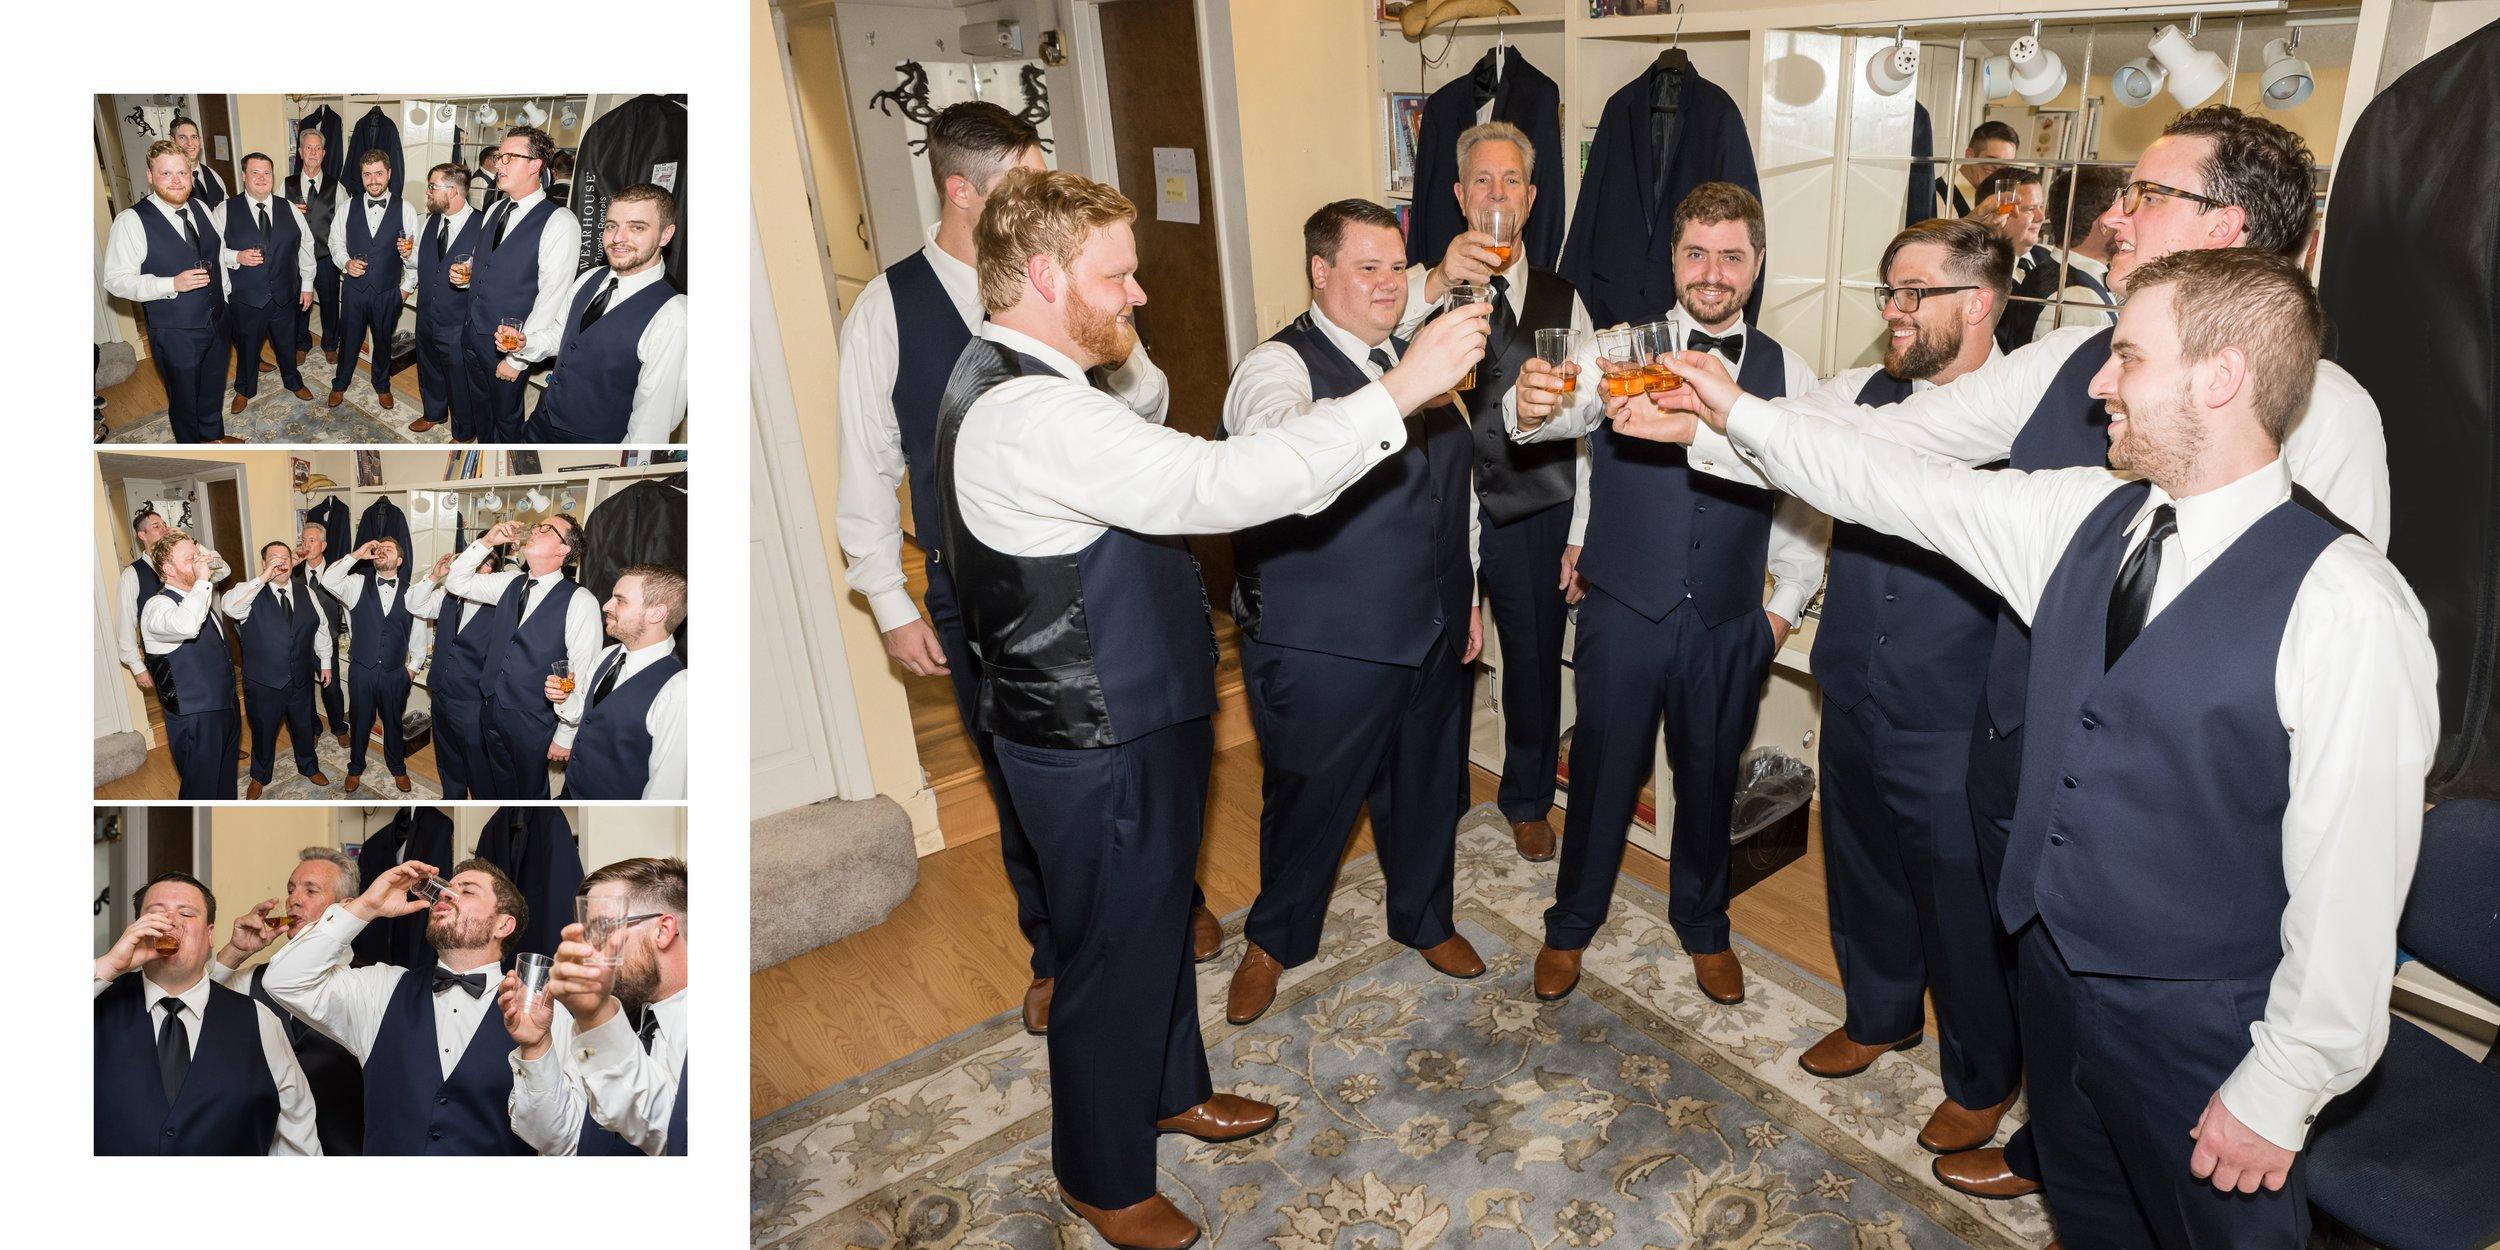 Nick and the groomsmen enjoy Bourbon shots